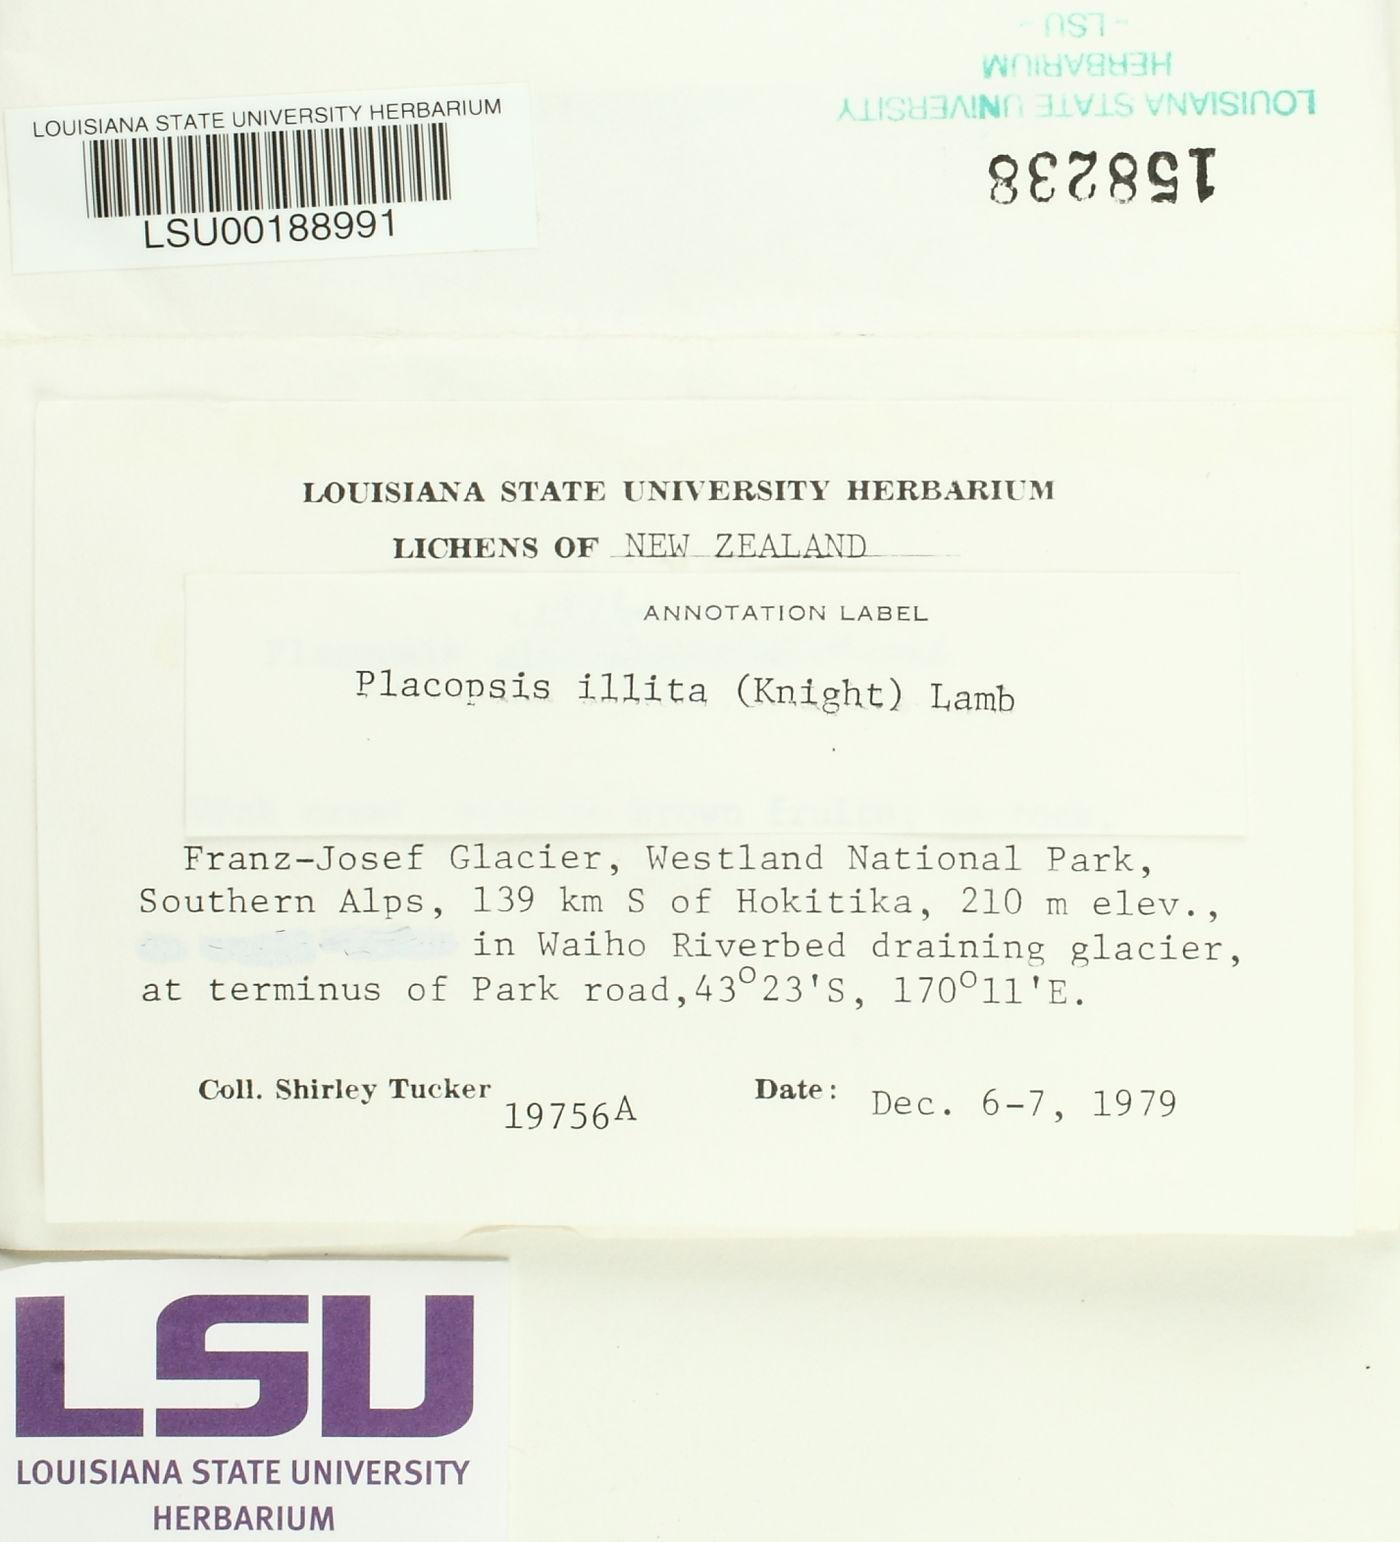 Placopsis illita image